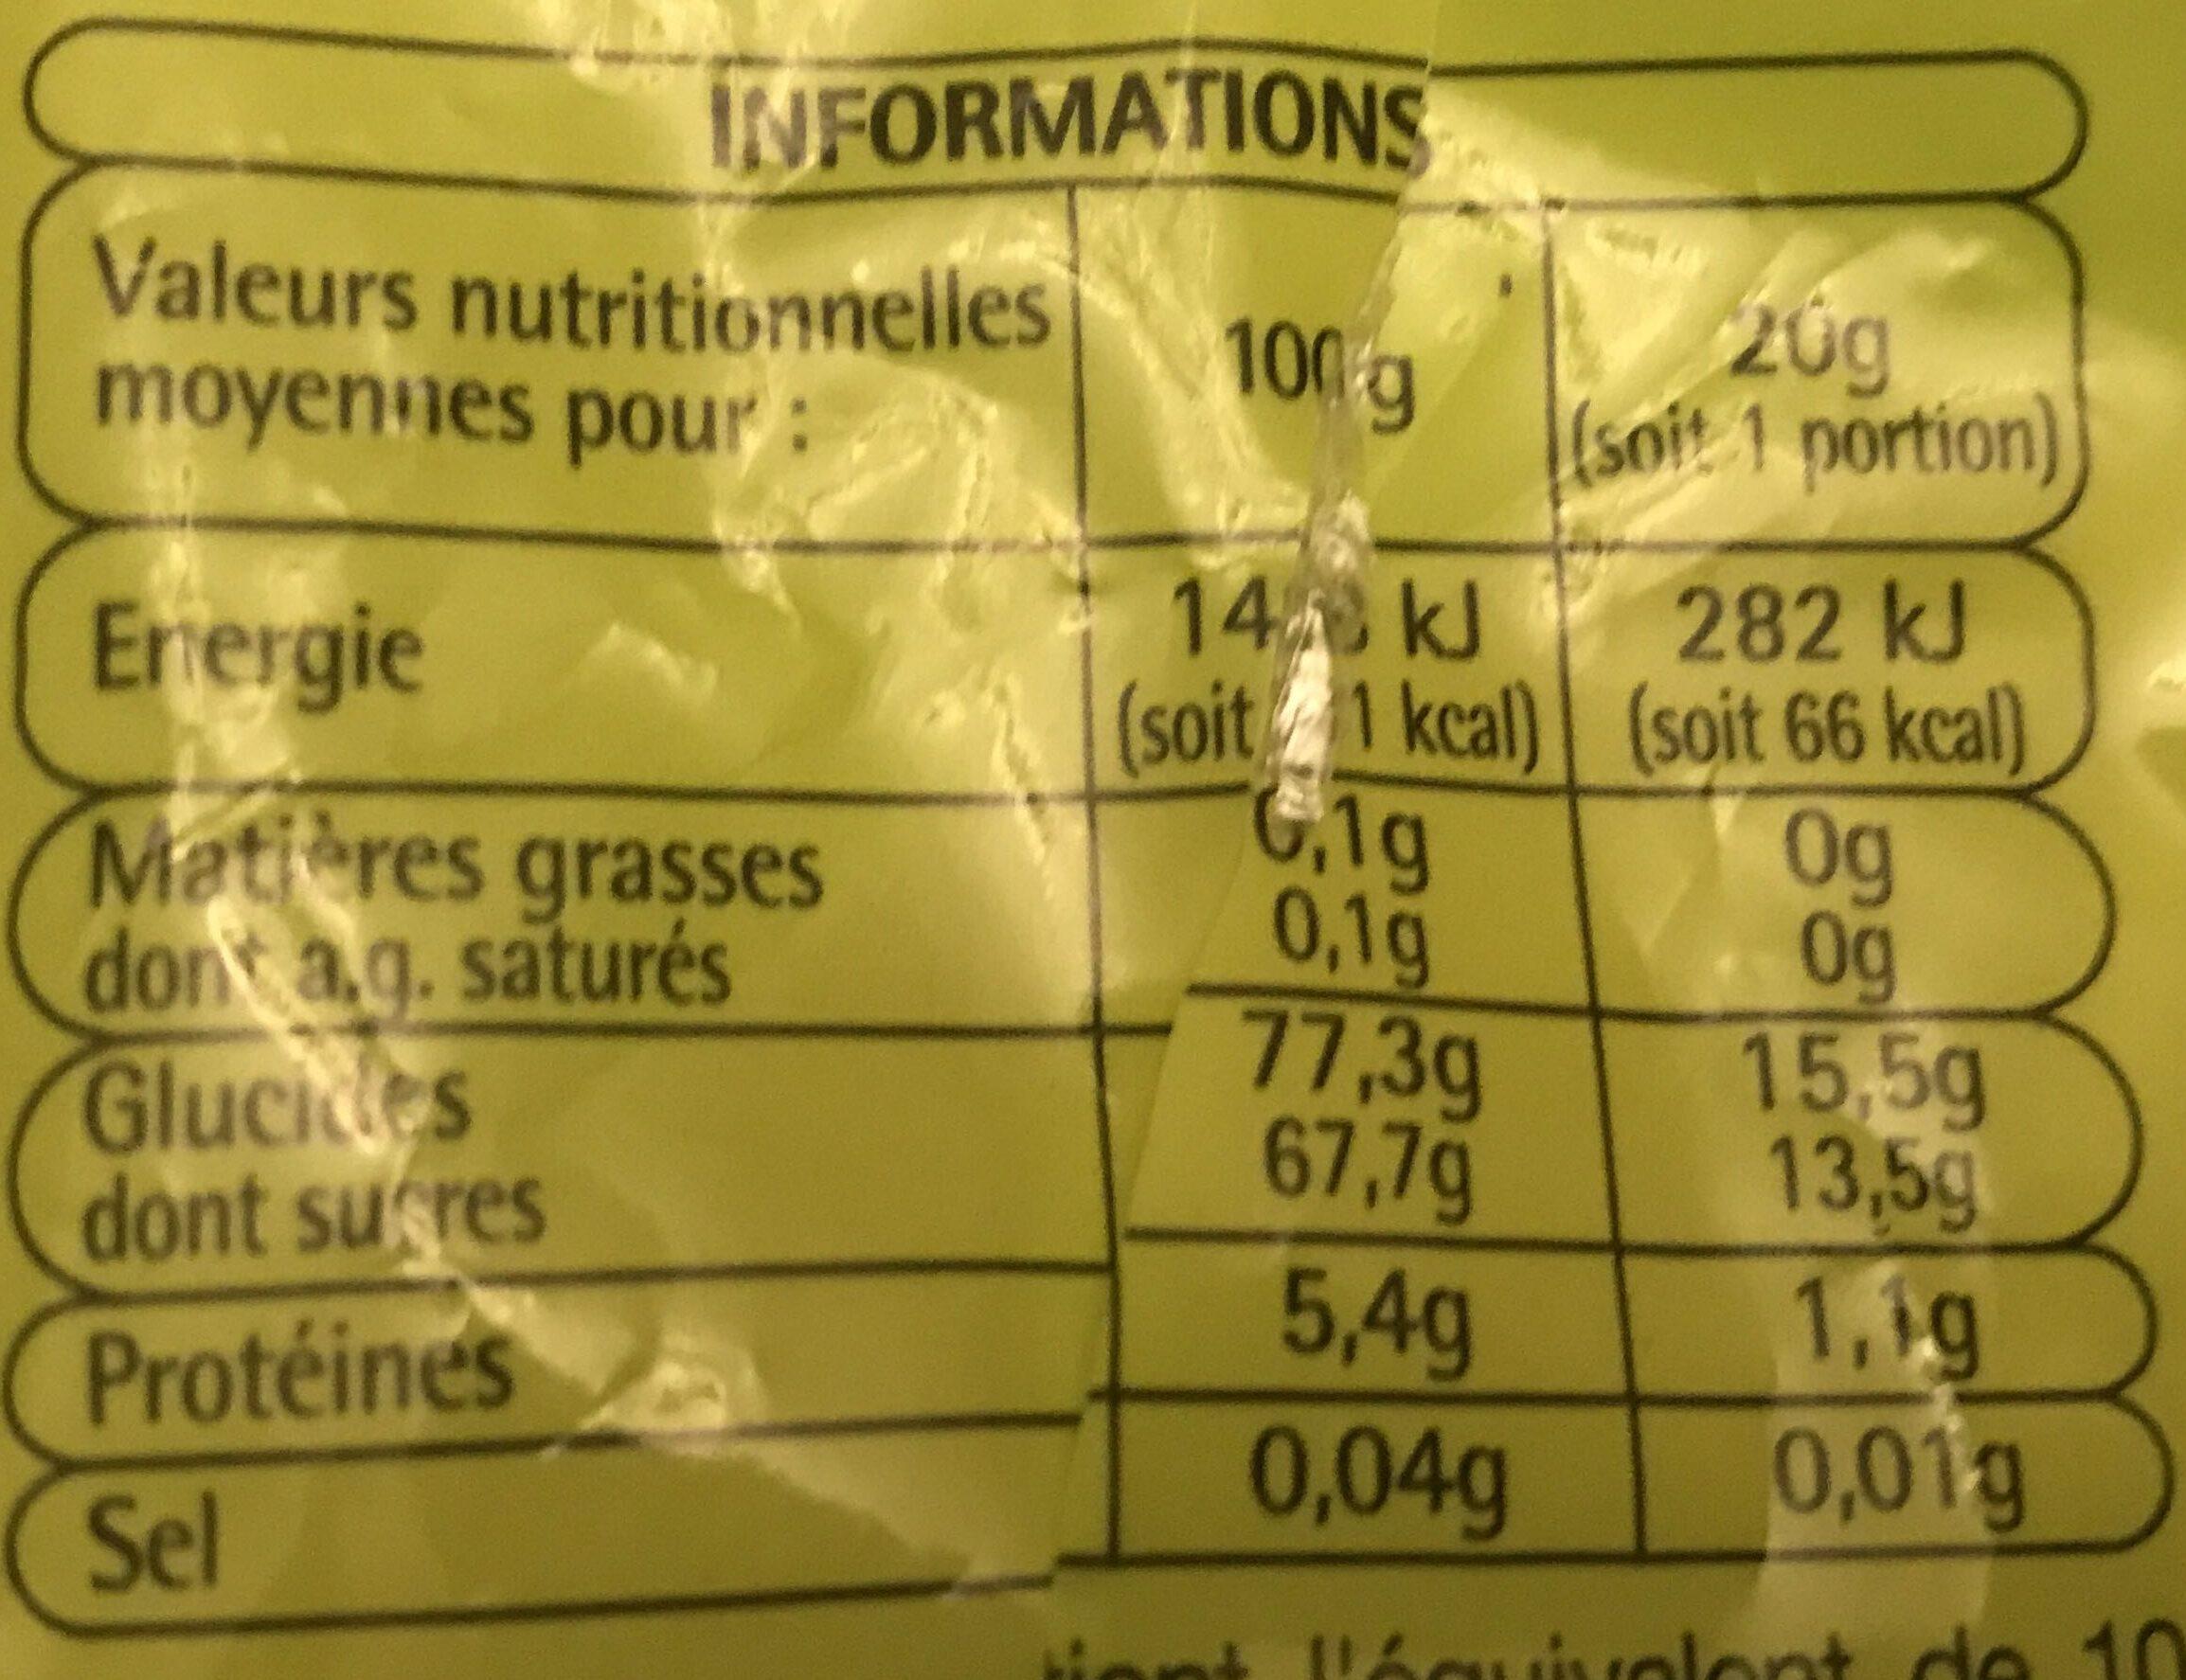 Bouteilles goût cola 200g - Nutrition facts - fr